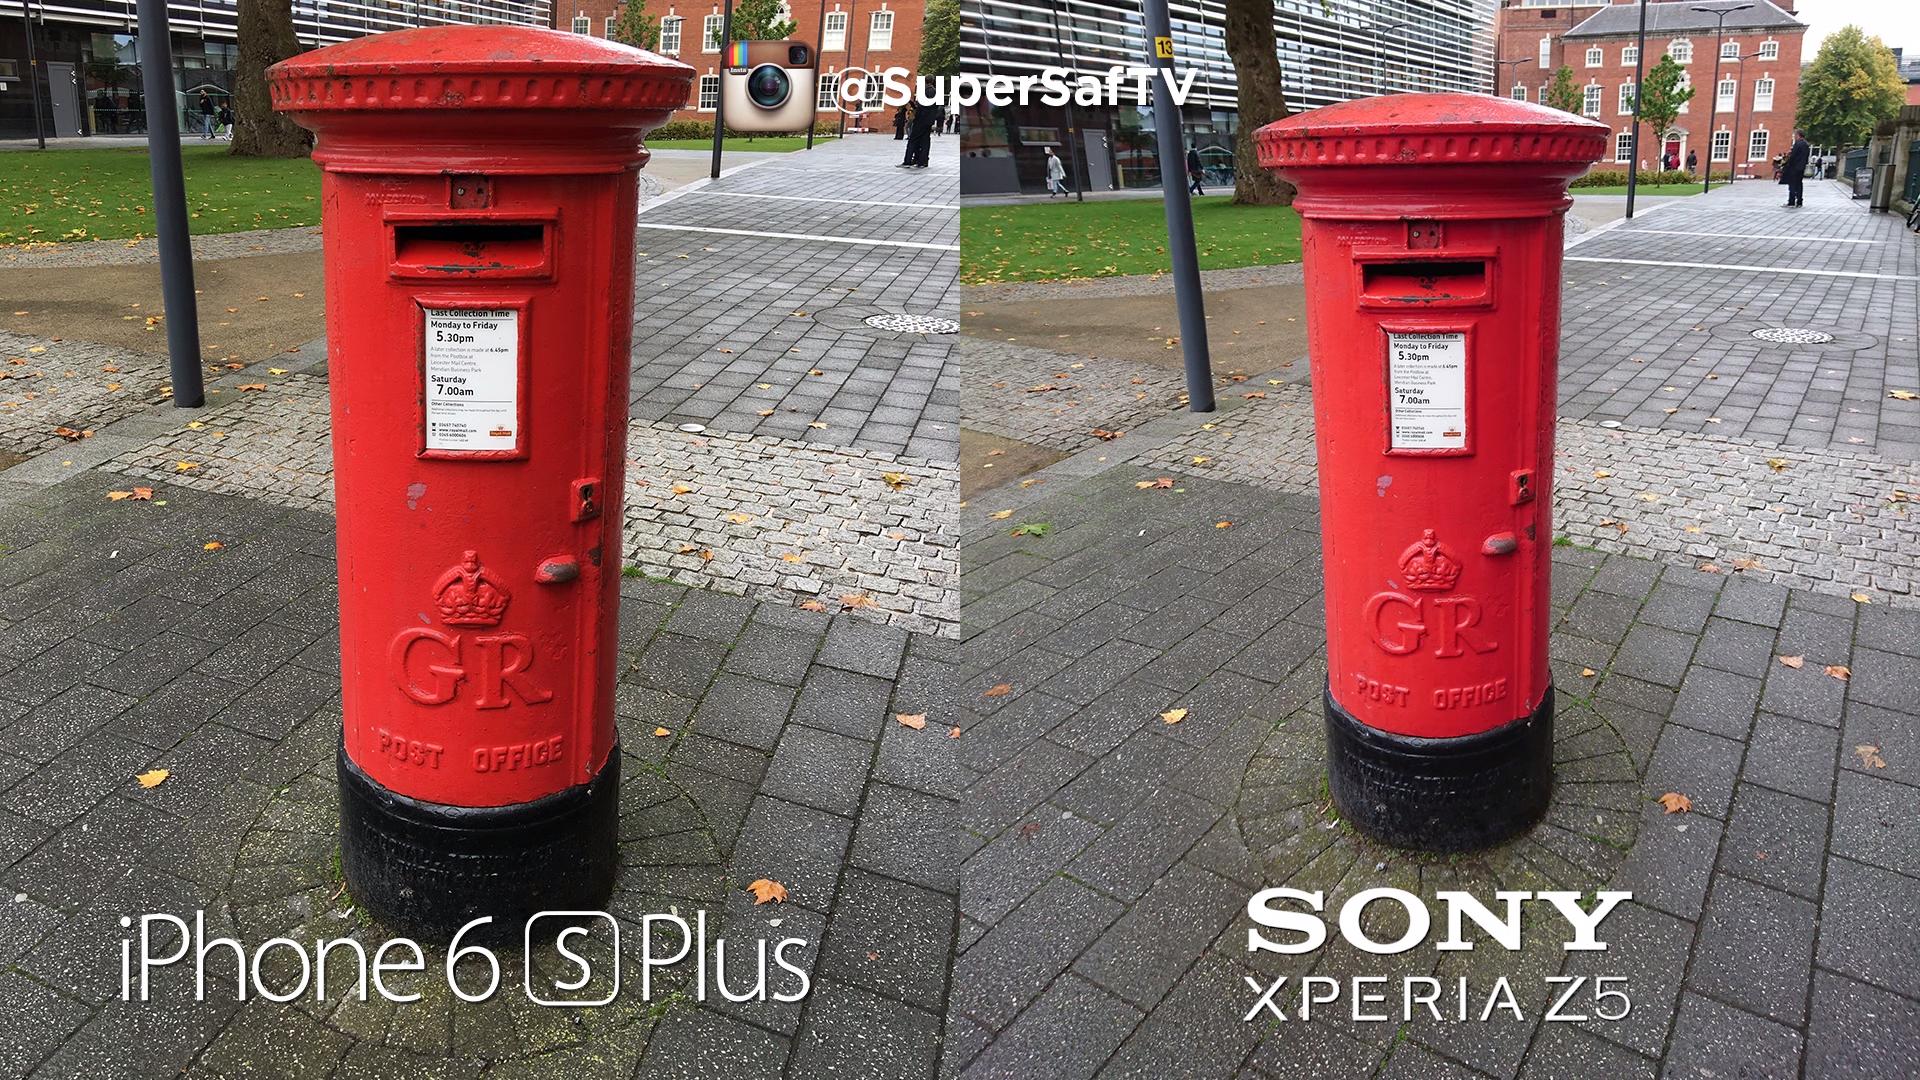 Xperia z5 vs iPhone 6s plus (4)